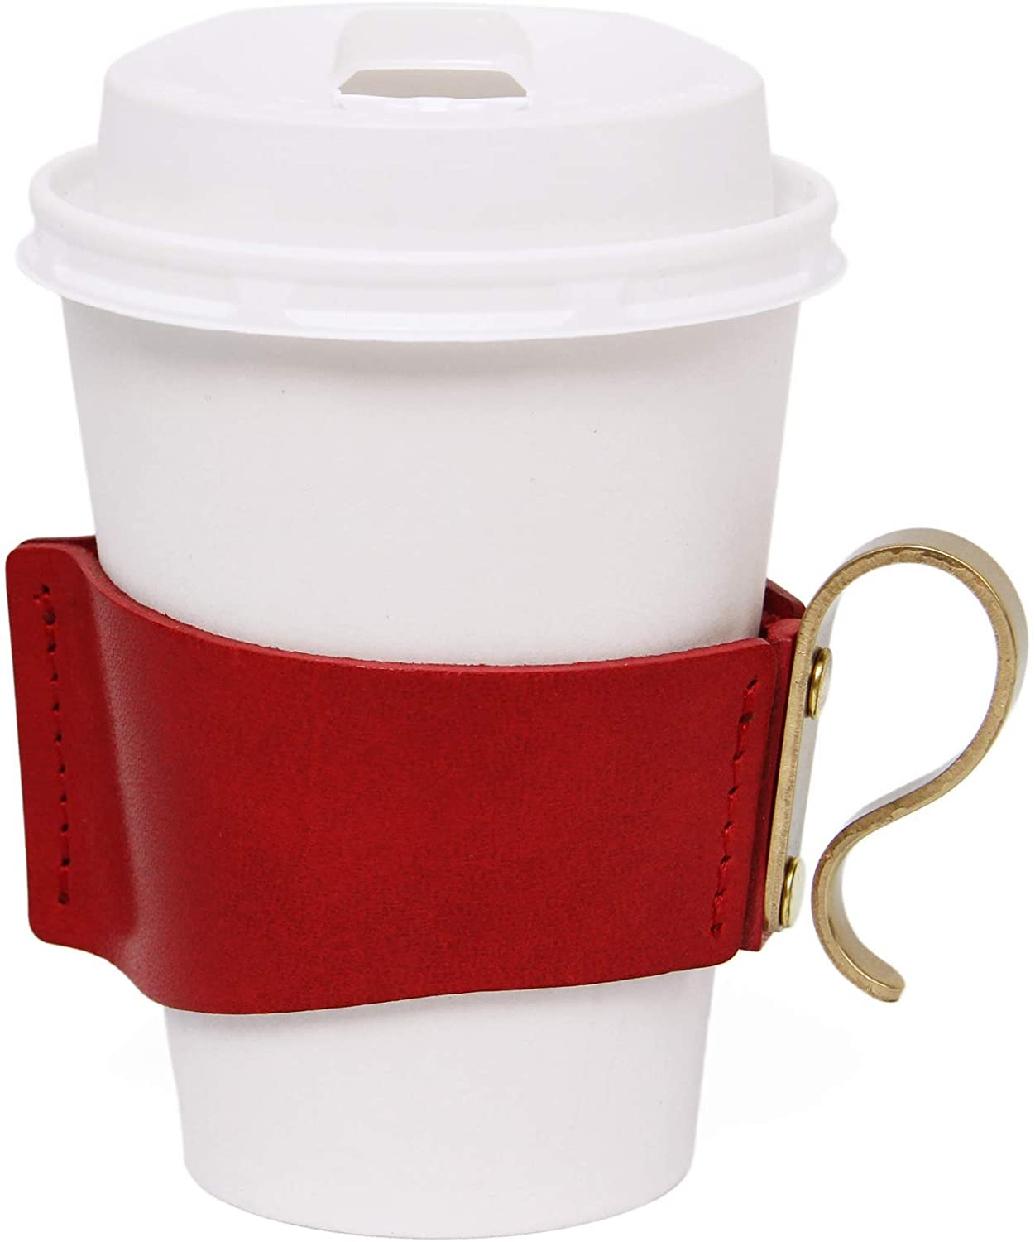 clife(クリフ)coffee and life コーヒースリーブの商品画像